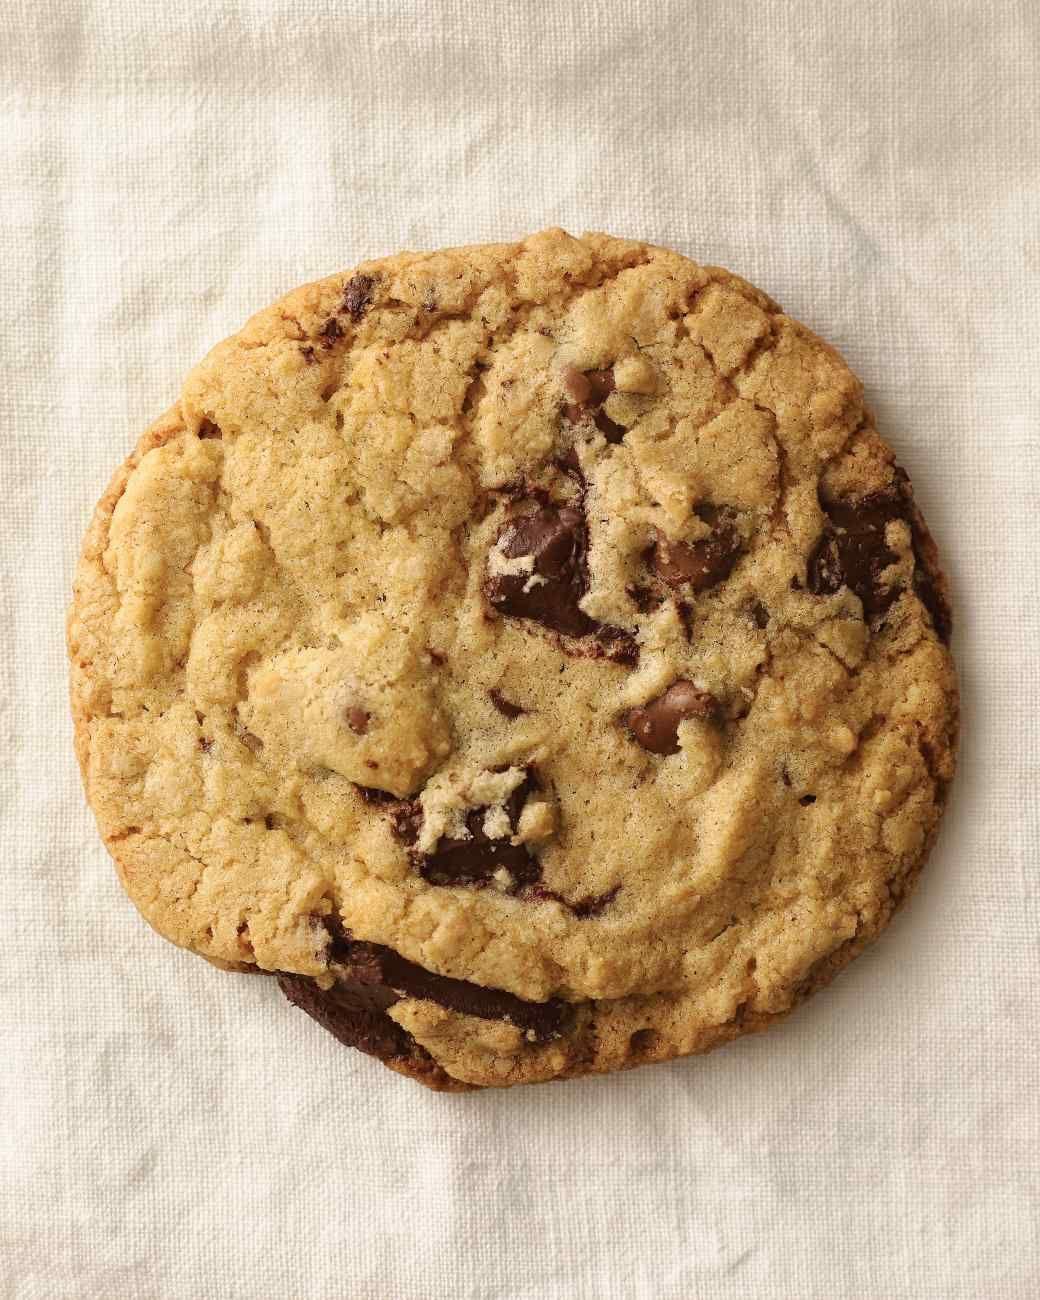 Persimmon cookie recipe martha stewart - Food next recipes